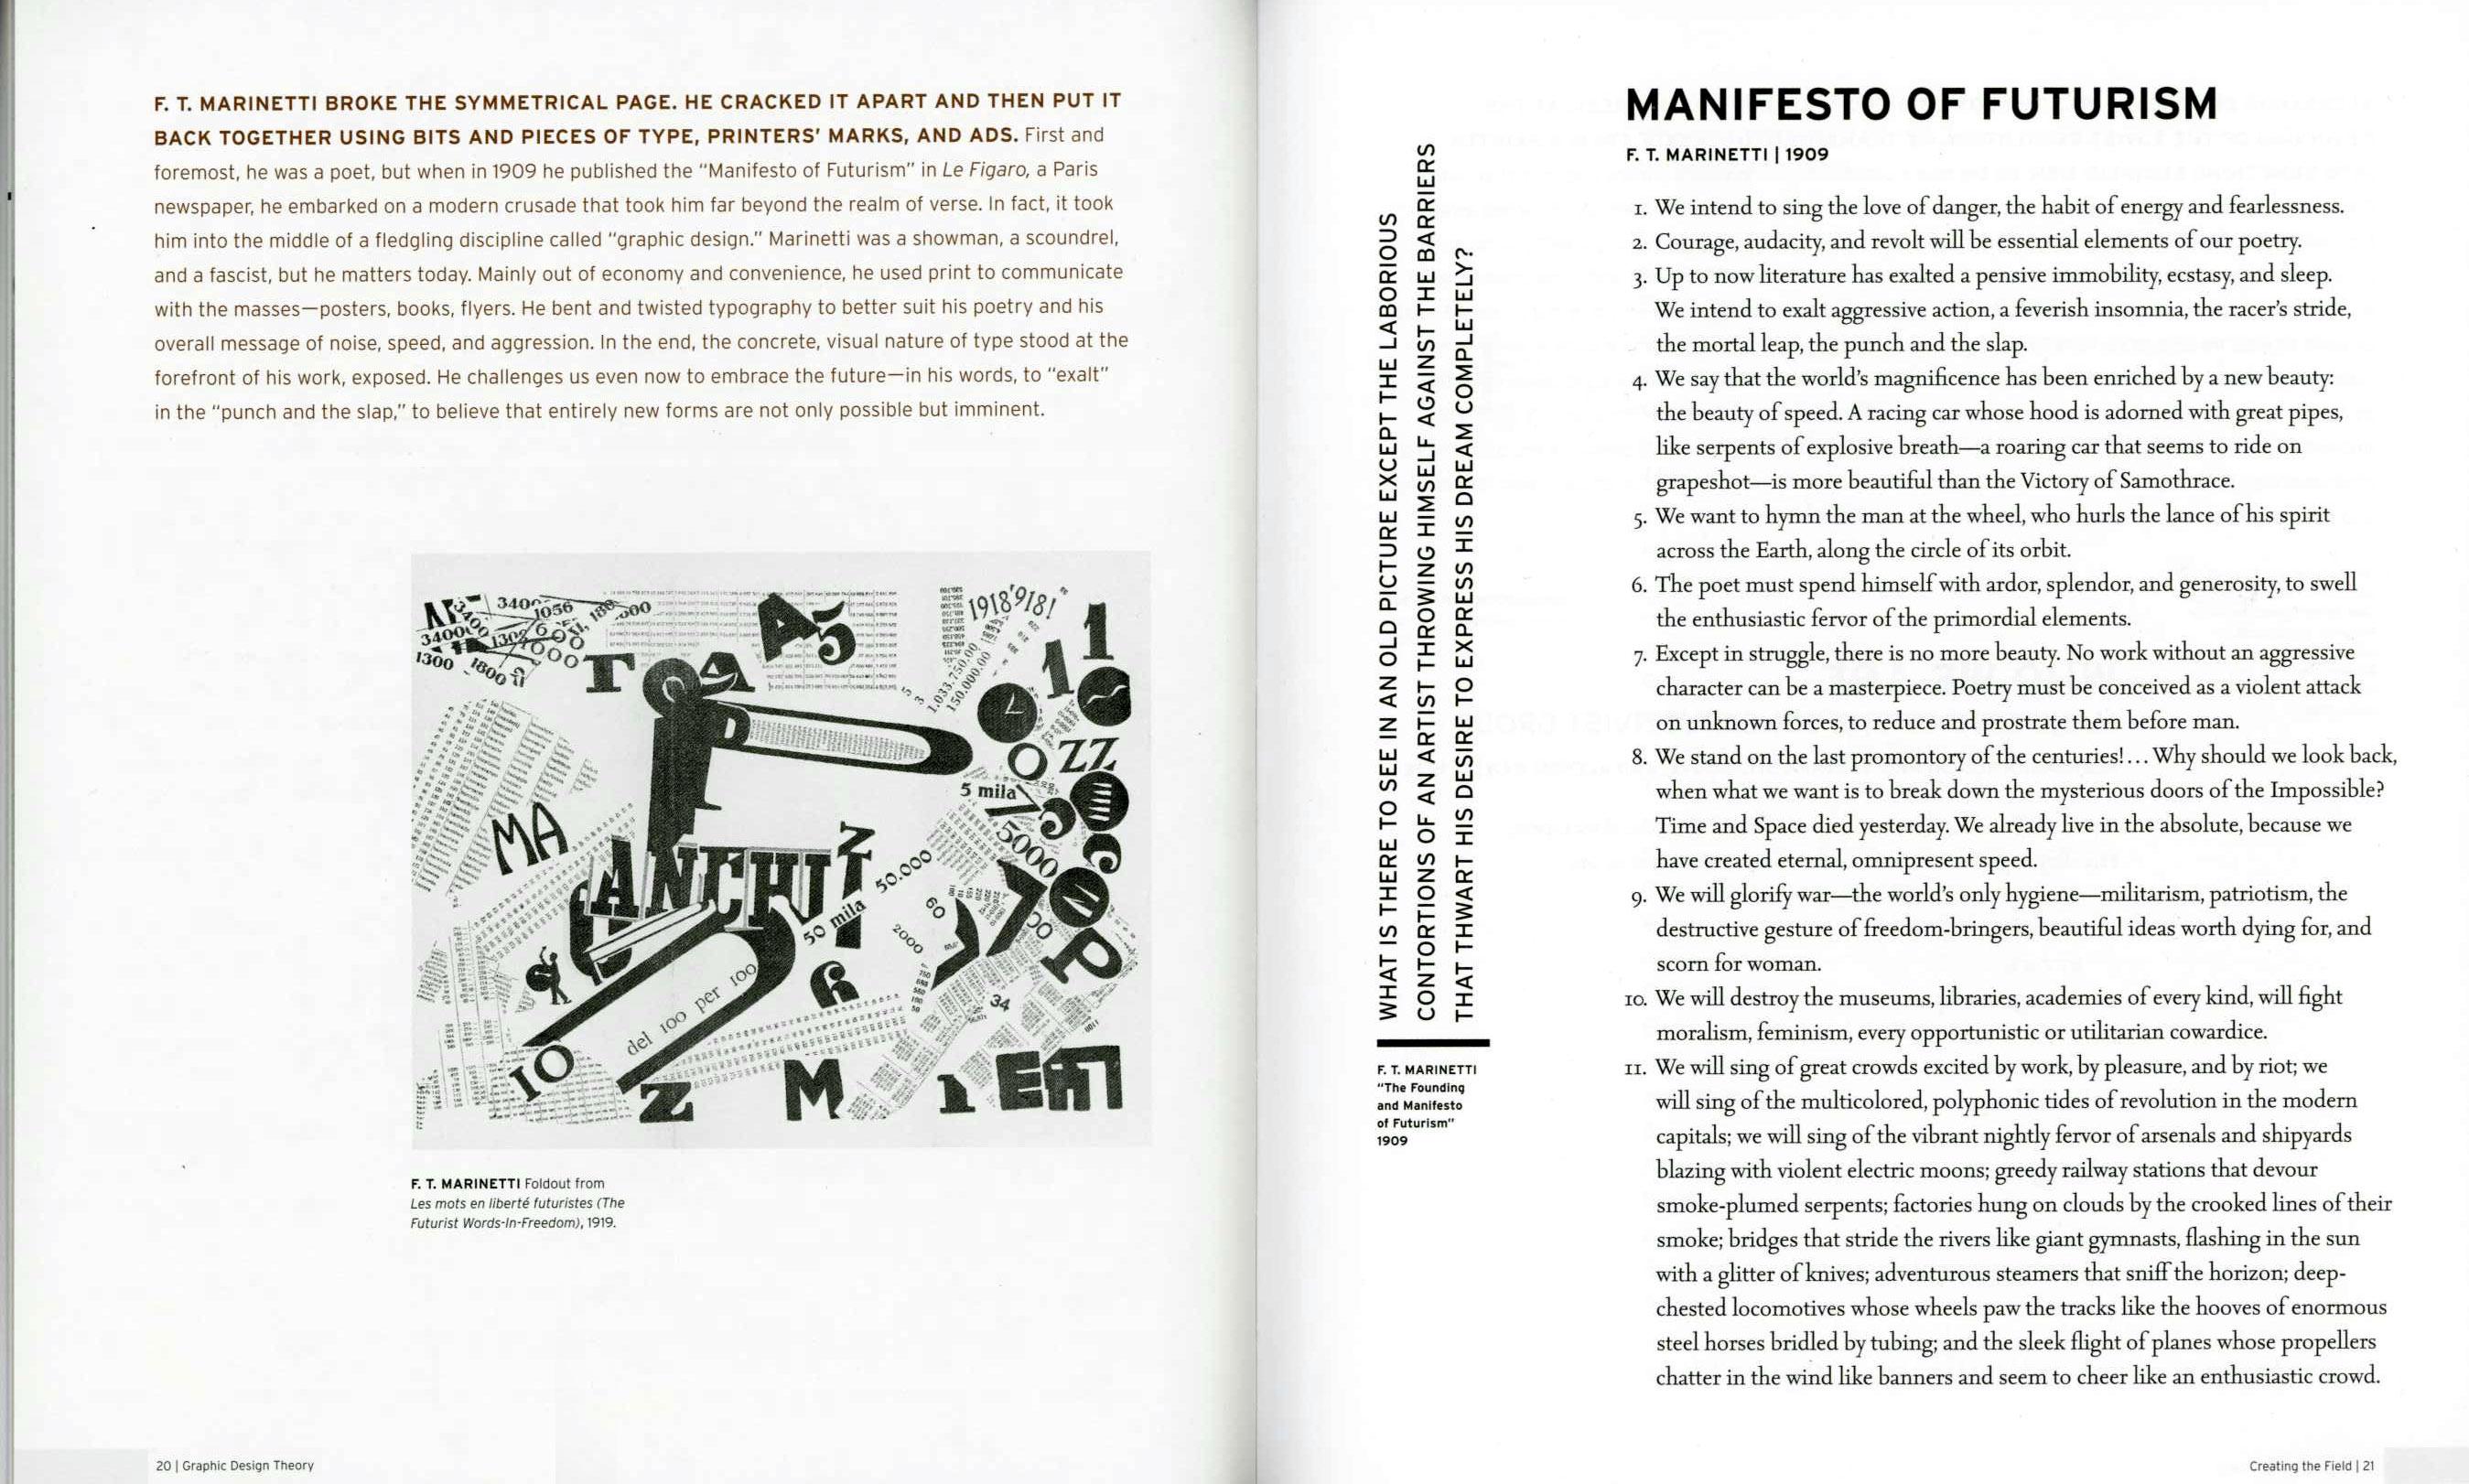 futurist-manifesto